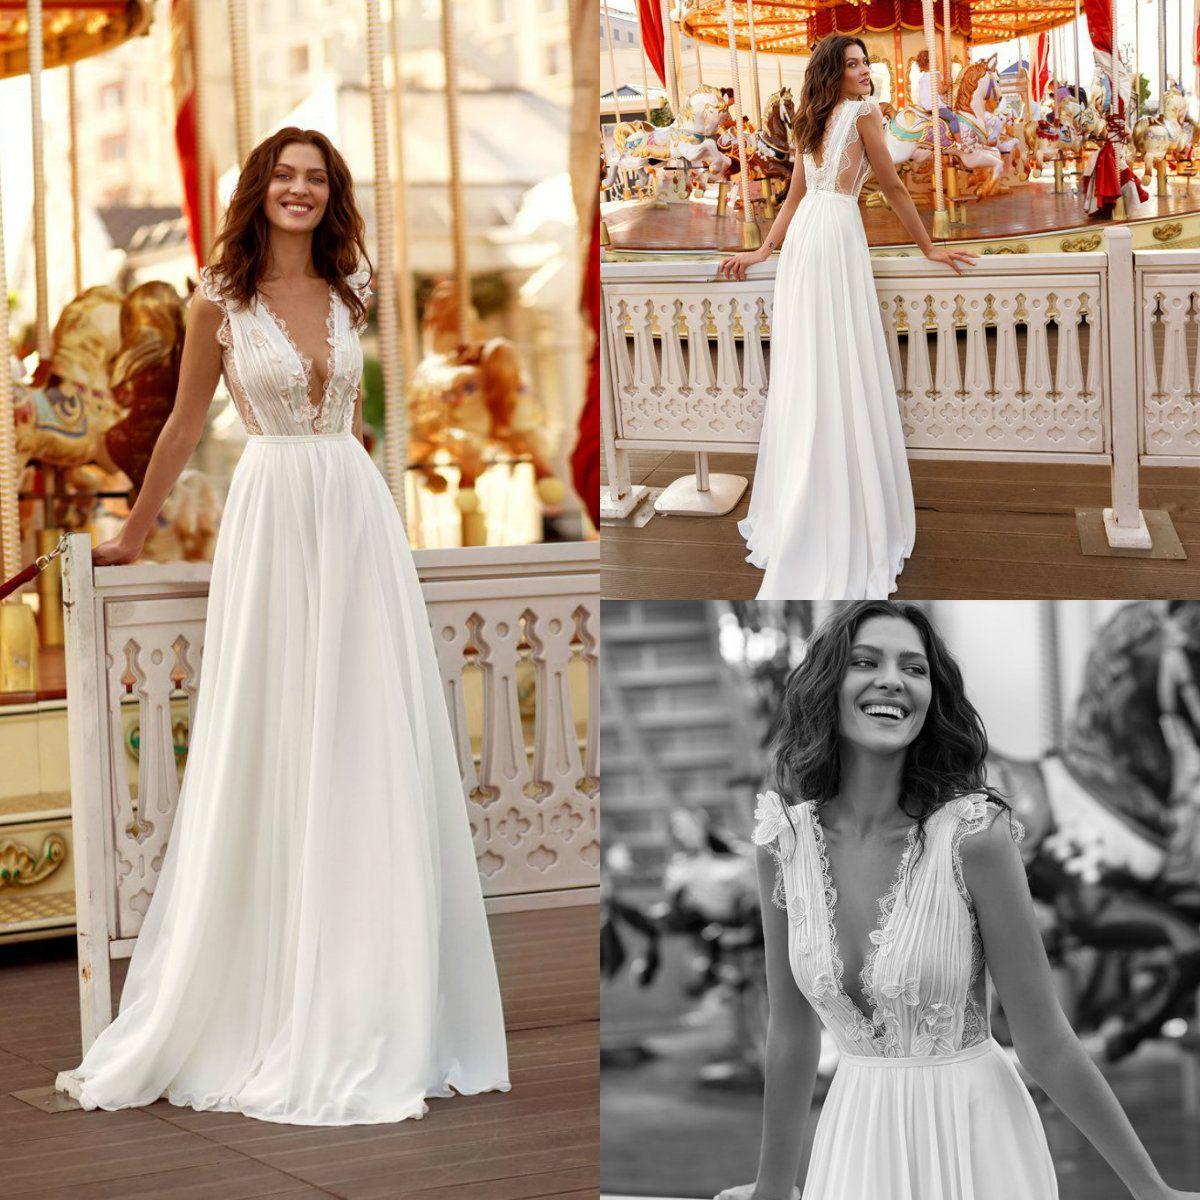 Discount Liz Martinez 2018 Beach Wedding Dresses Sweep Train Lace V Neck  Backless A Line Chiffon Skirts Bohemian Wedding Dress Vestidos De Noiva  Cheap Plus ... e3b86e48a